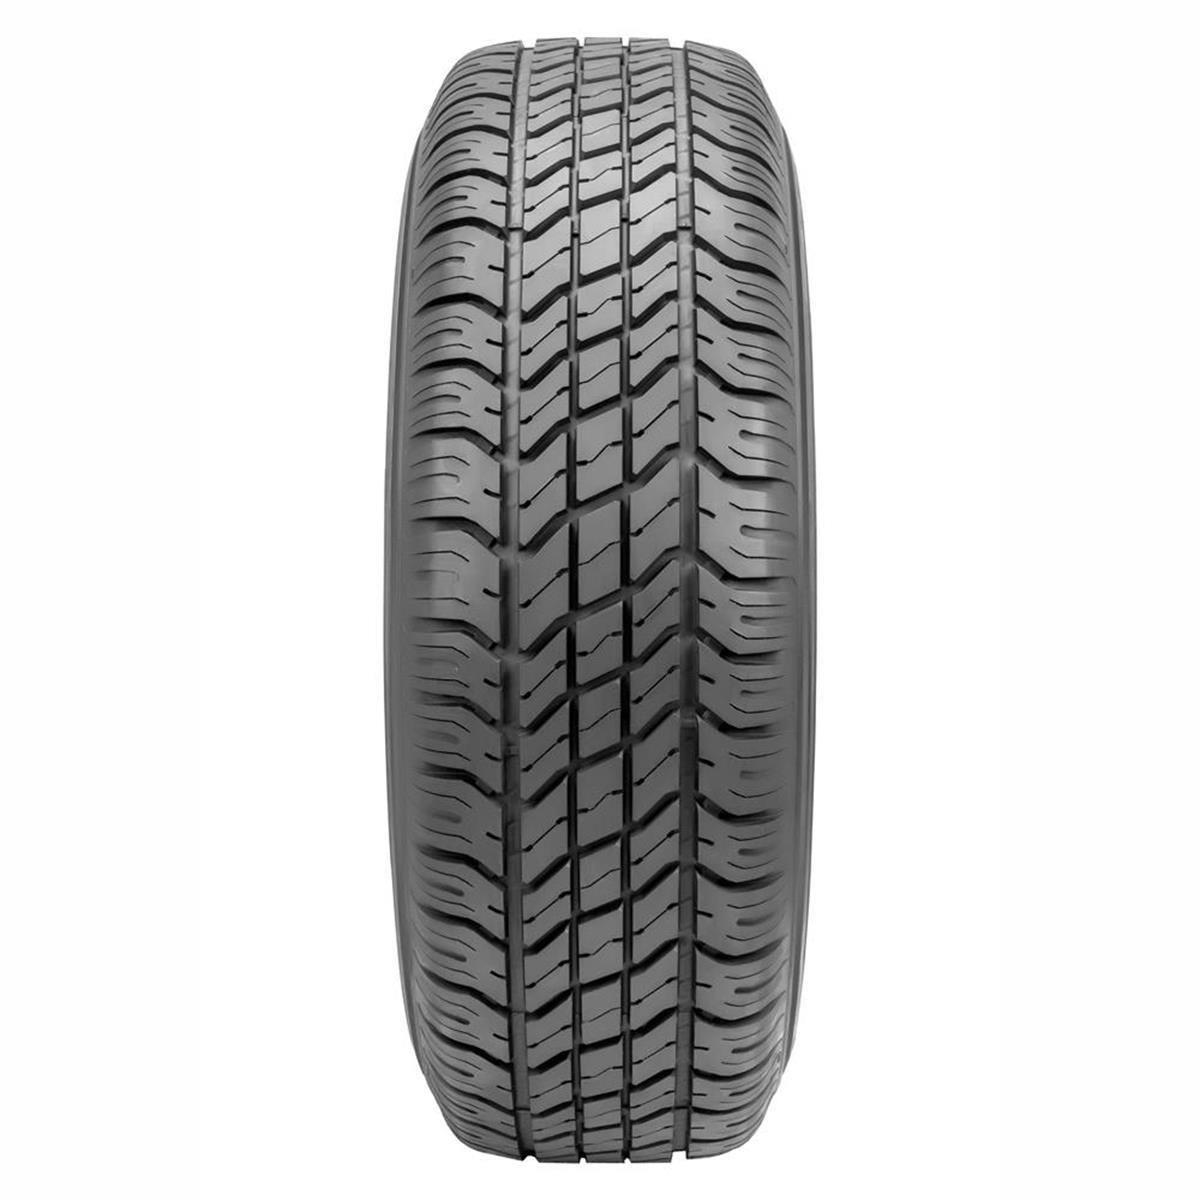 Kit 04 Pneus 205/70 R 15 - Formula S/T 96T - Pirelli